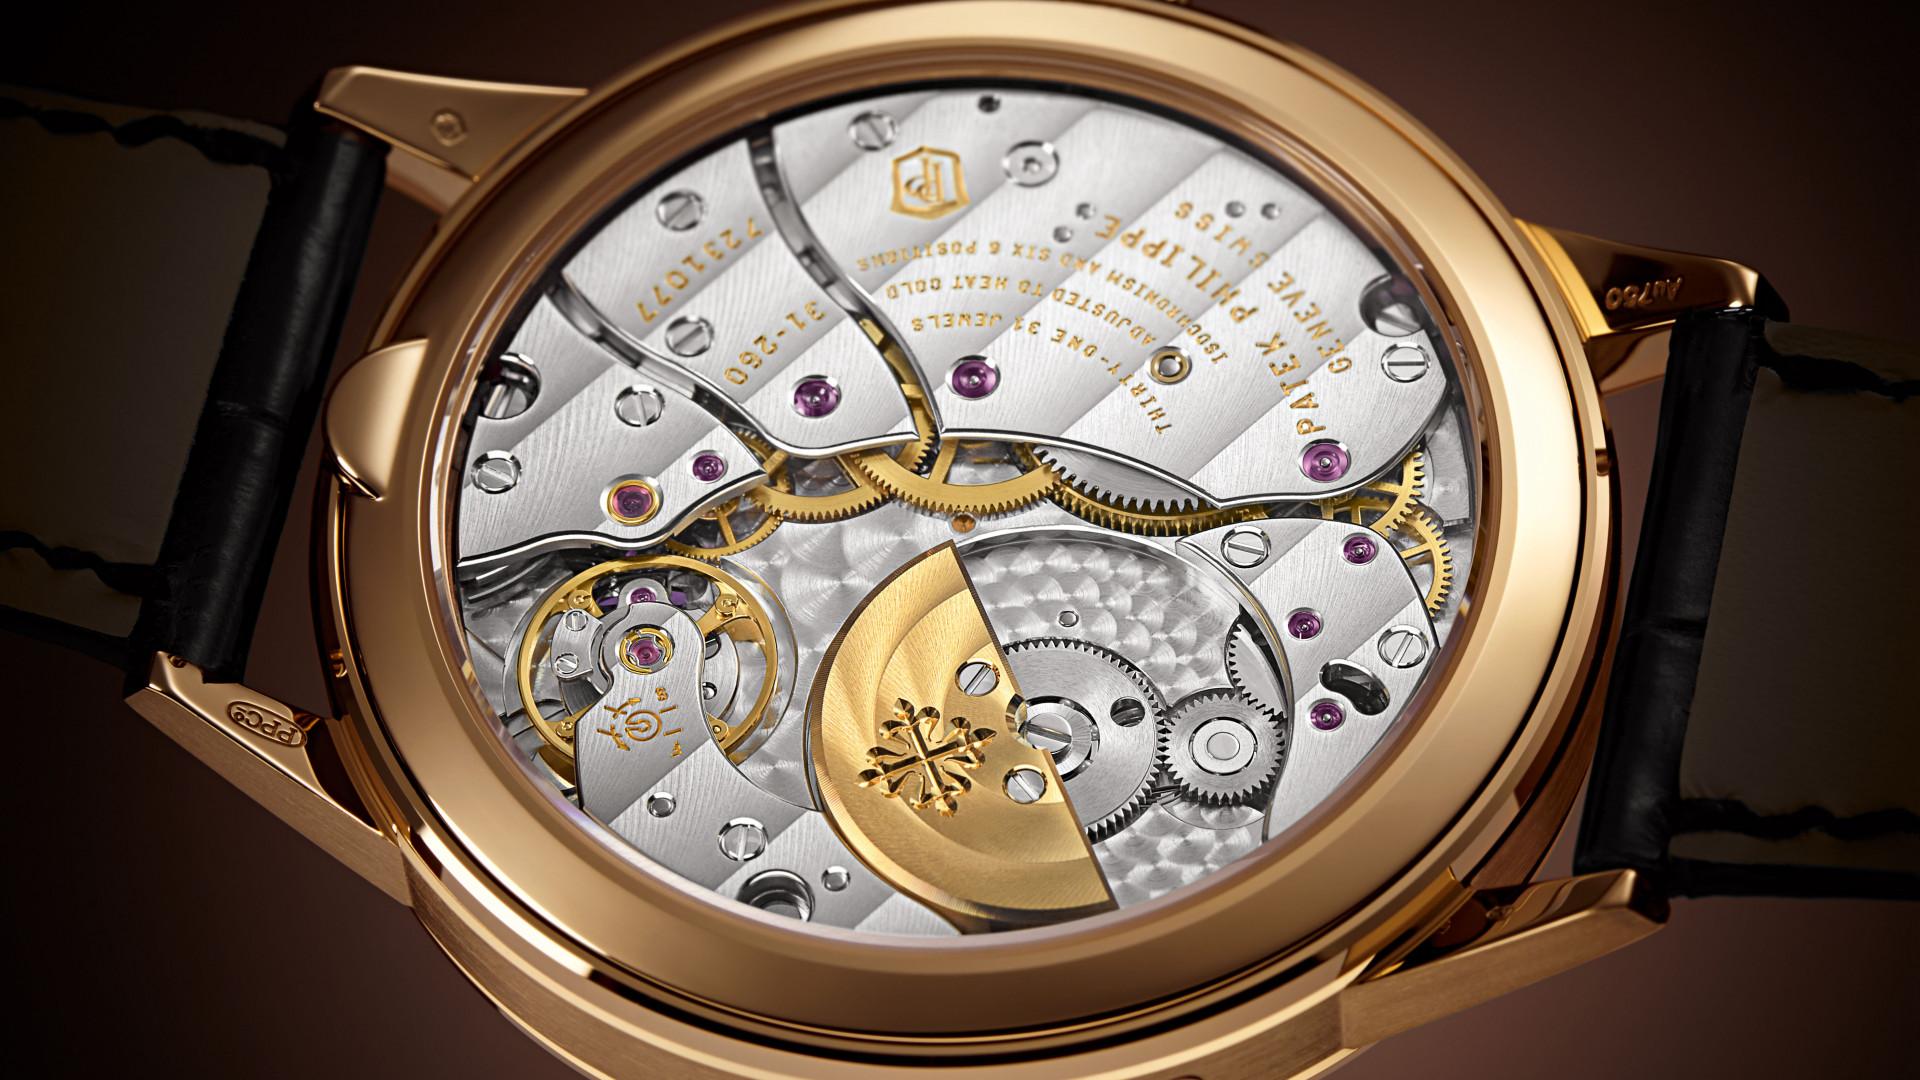 Patek Philippe Ref. 5235R Annual Calendar Regulator